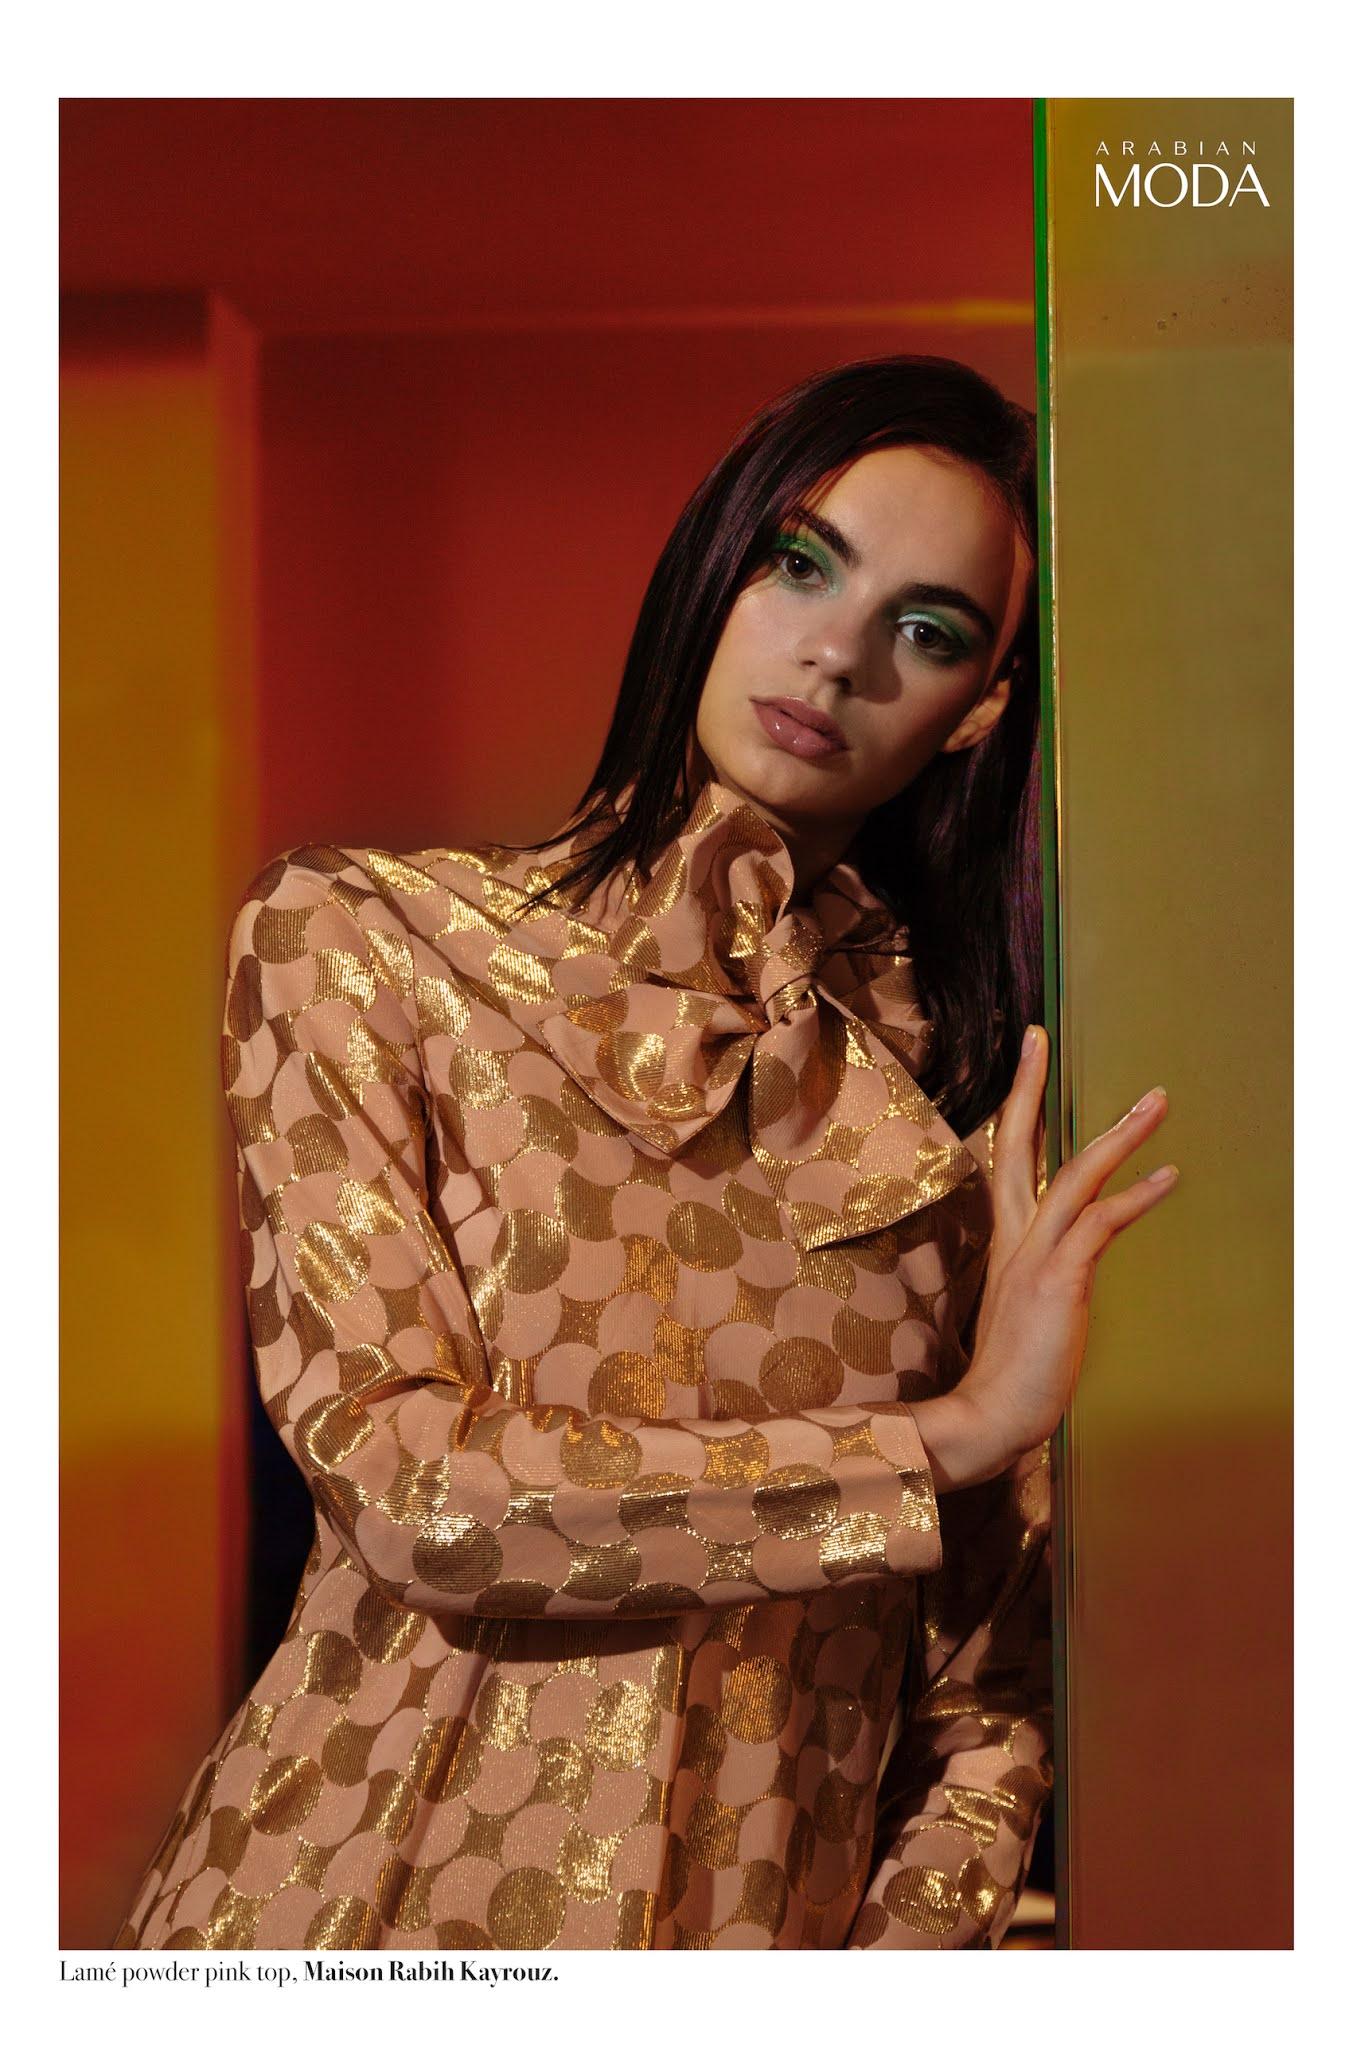 Arabian Moda x Maison Rabih Kayrouz